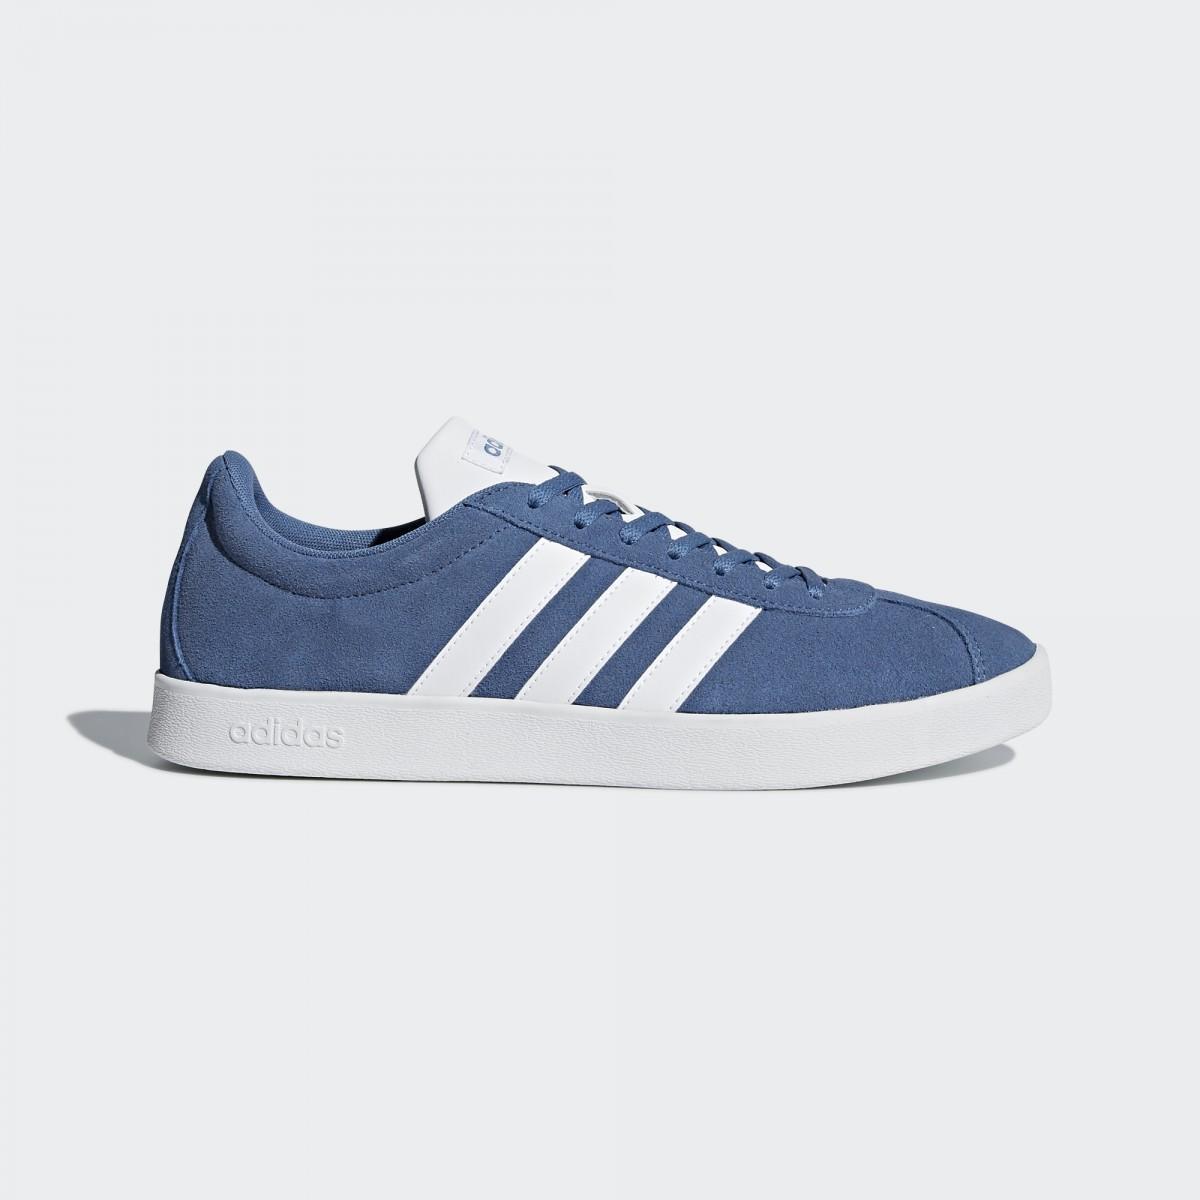 Katalog Adidas X Plr Murah Source · Adidas sepatu sneaker suede VL Court 2  0 DA9873 412f9468d1